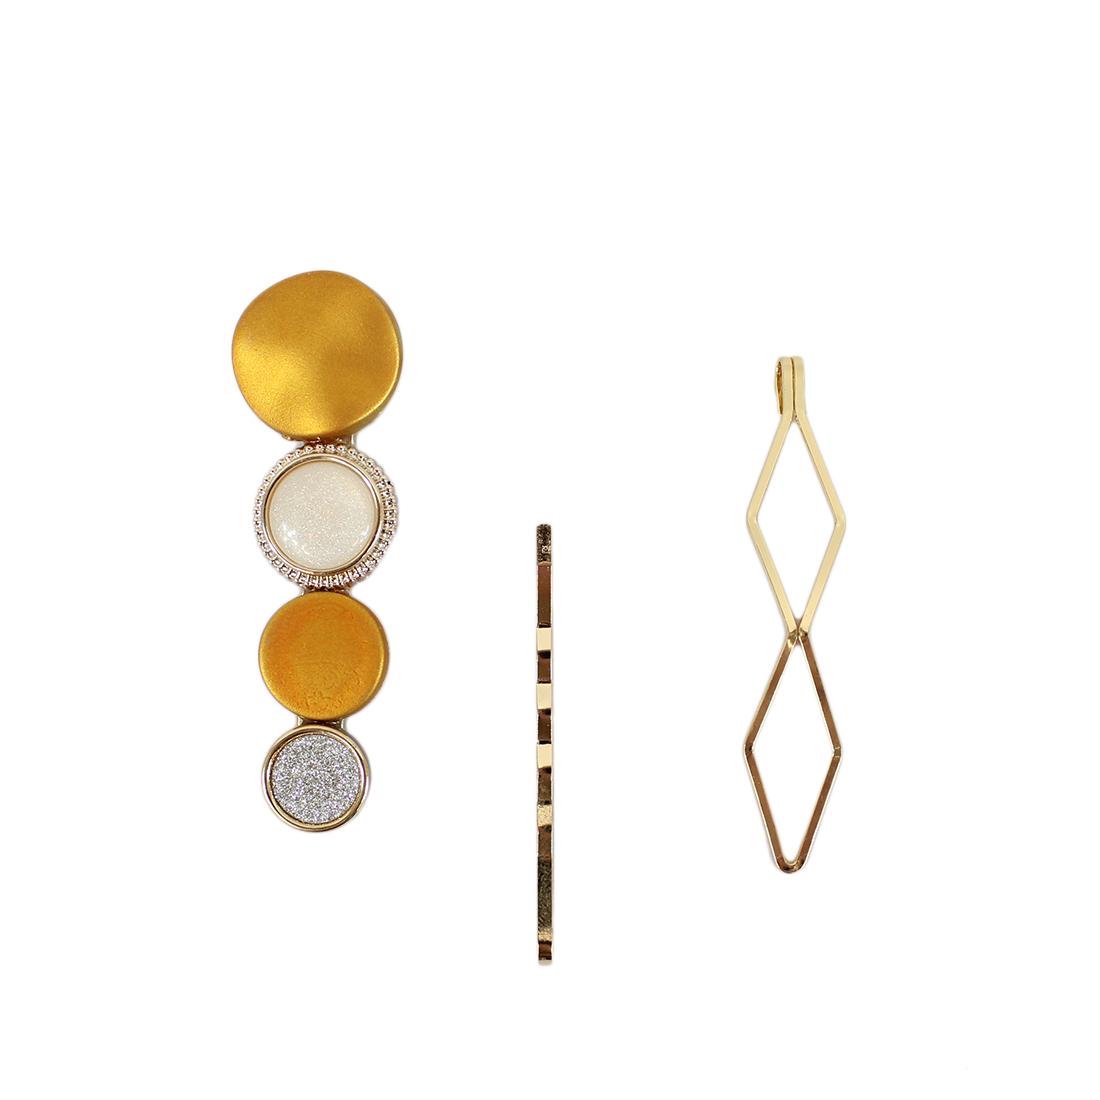 Set of three styles